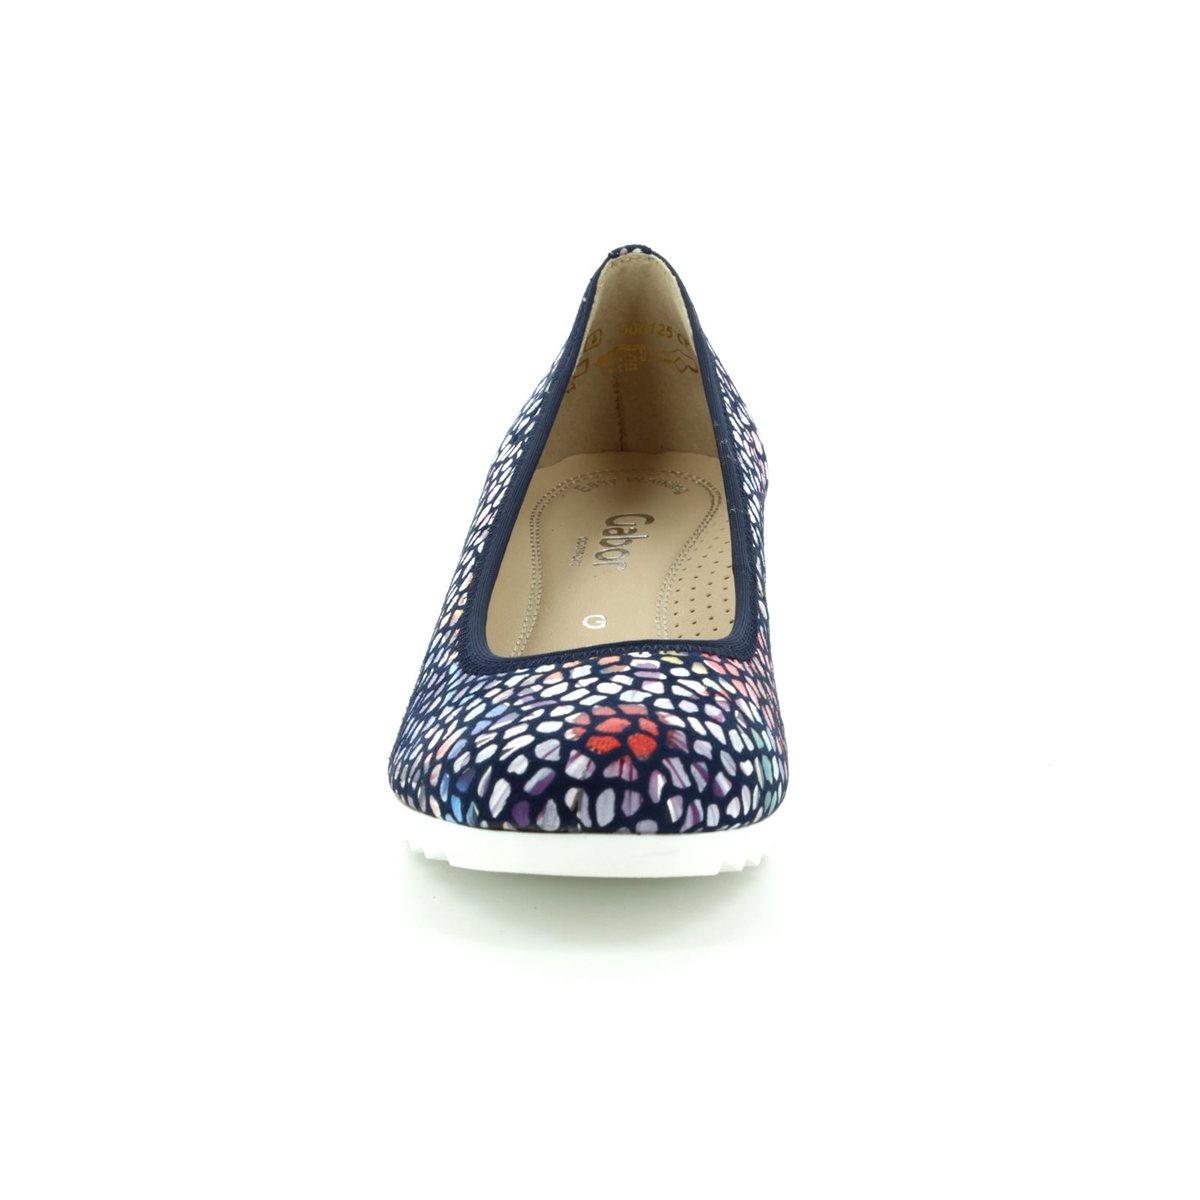 6ed4d229c Gabor Wedge Shoes - Multi Coloured - 82.641.41 EPWORTH